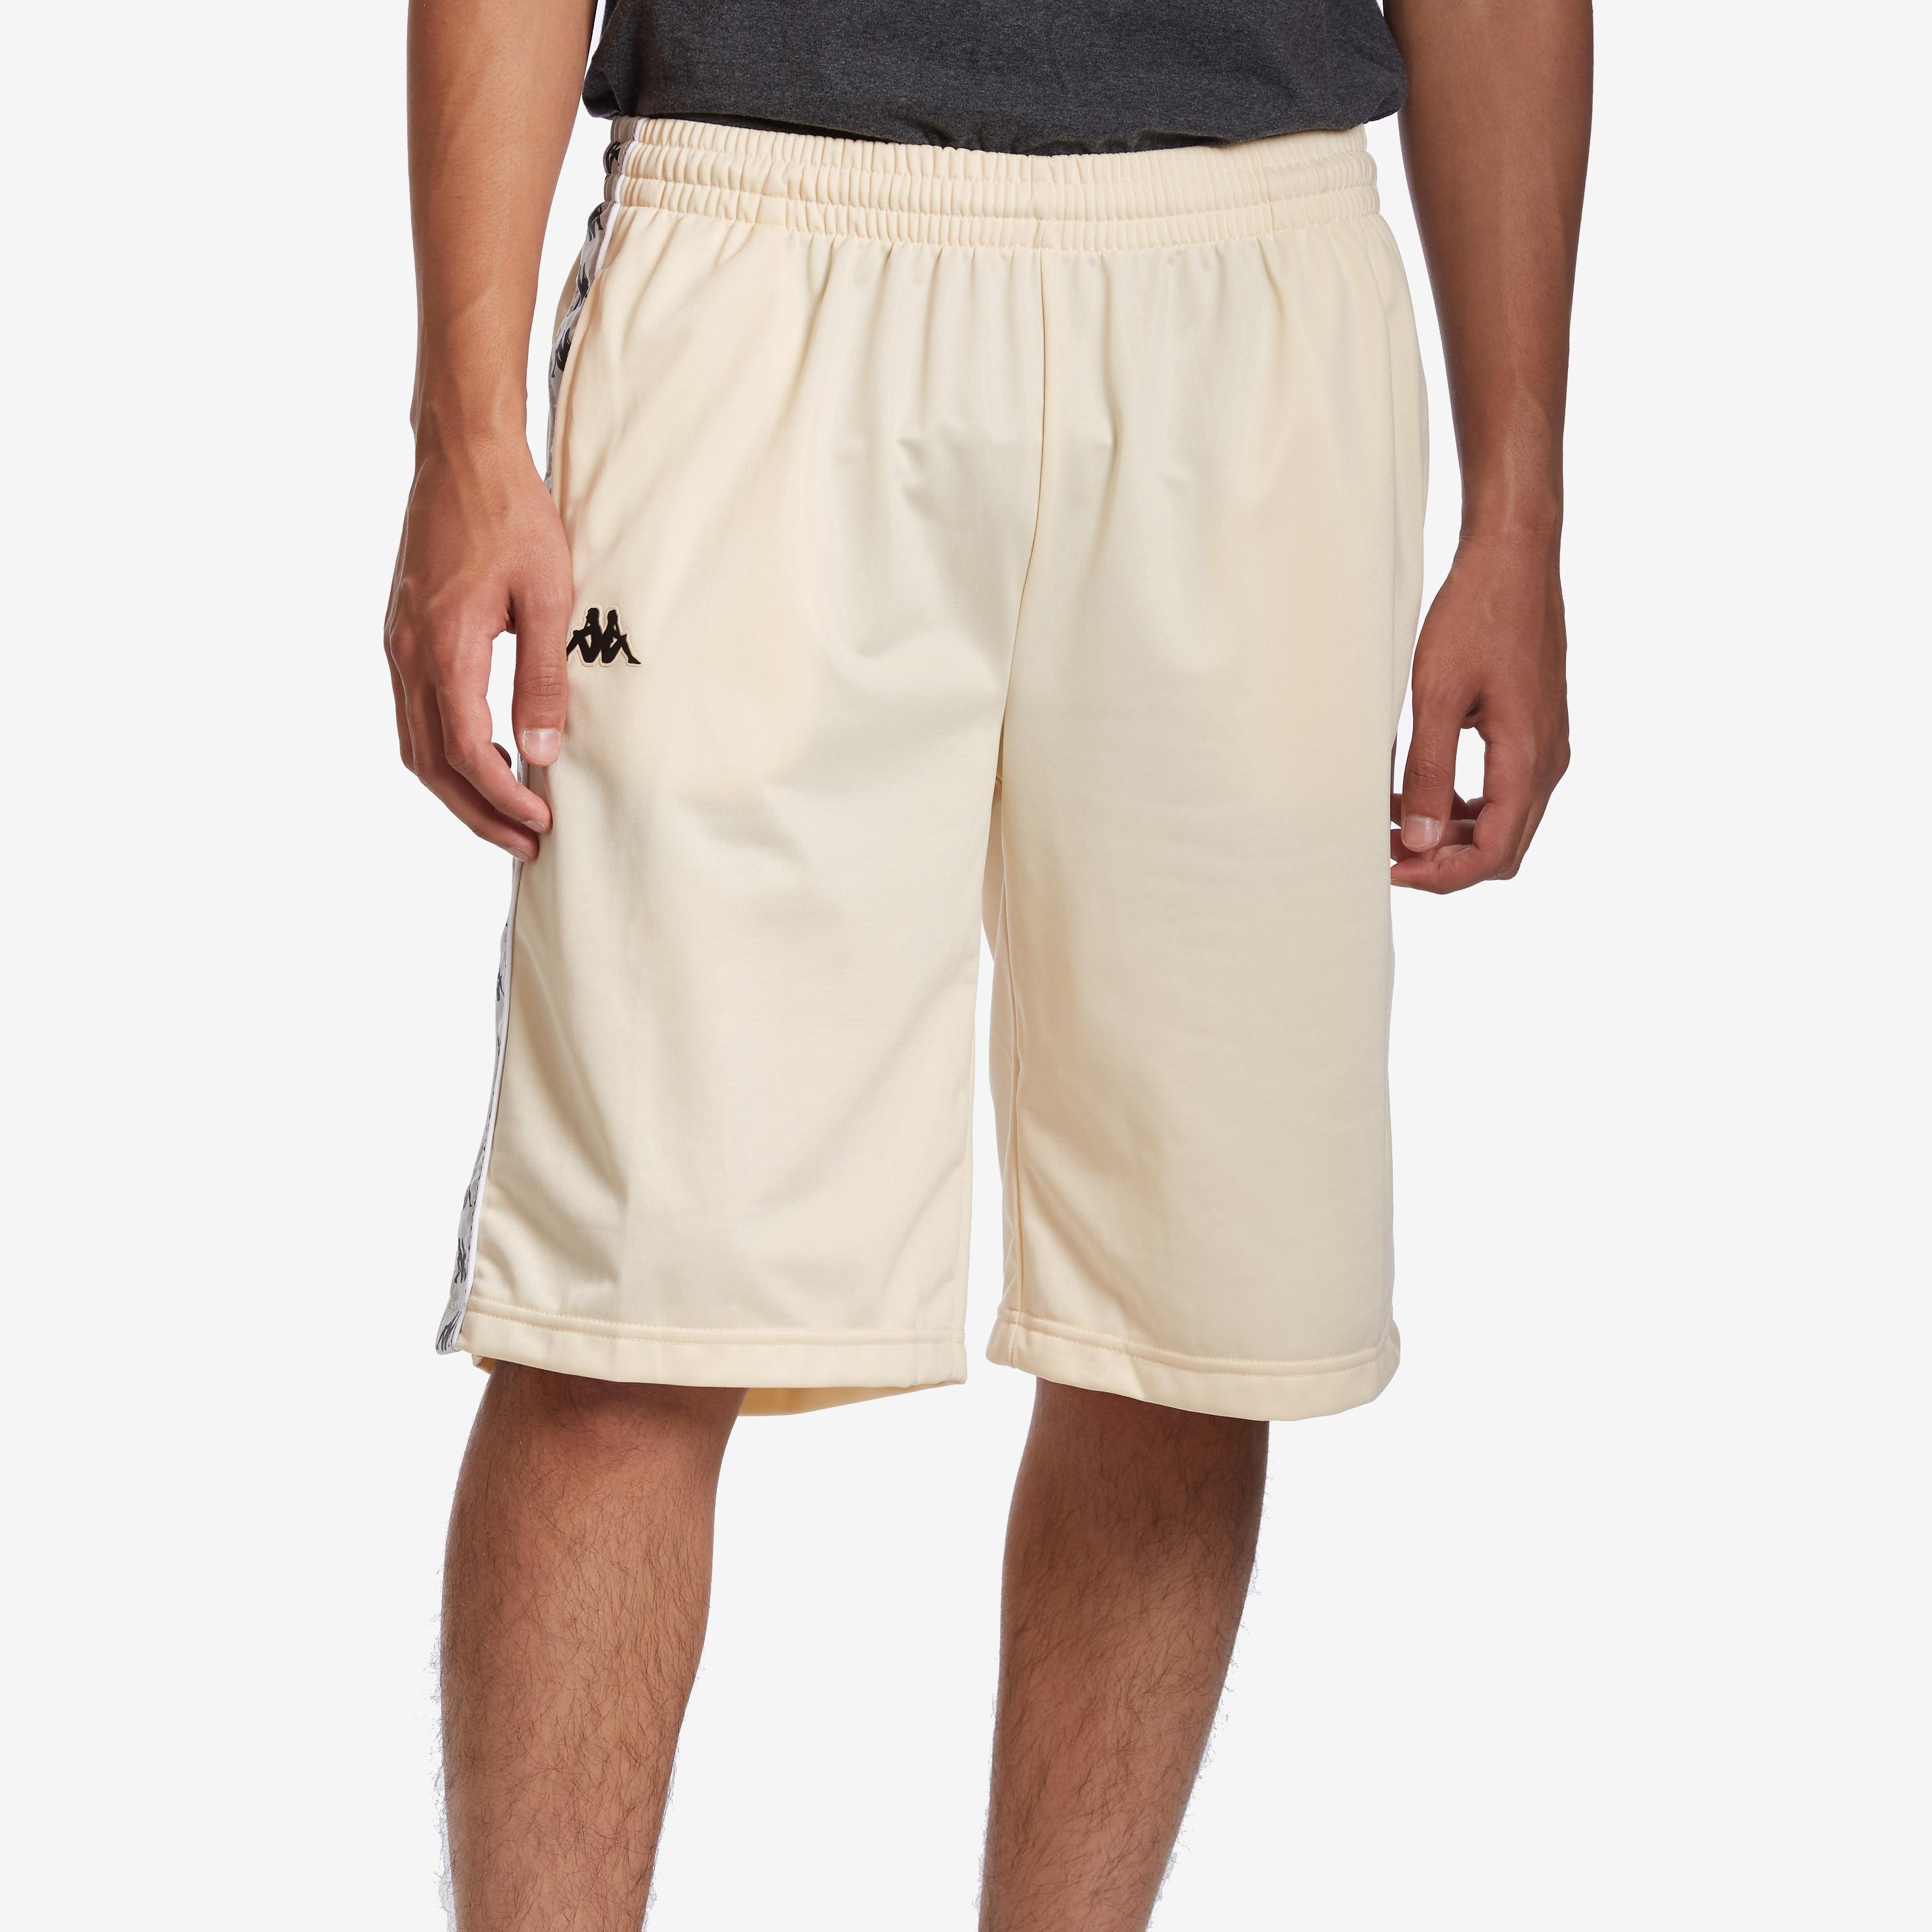 222 Banda Treadwellz Shorts